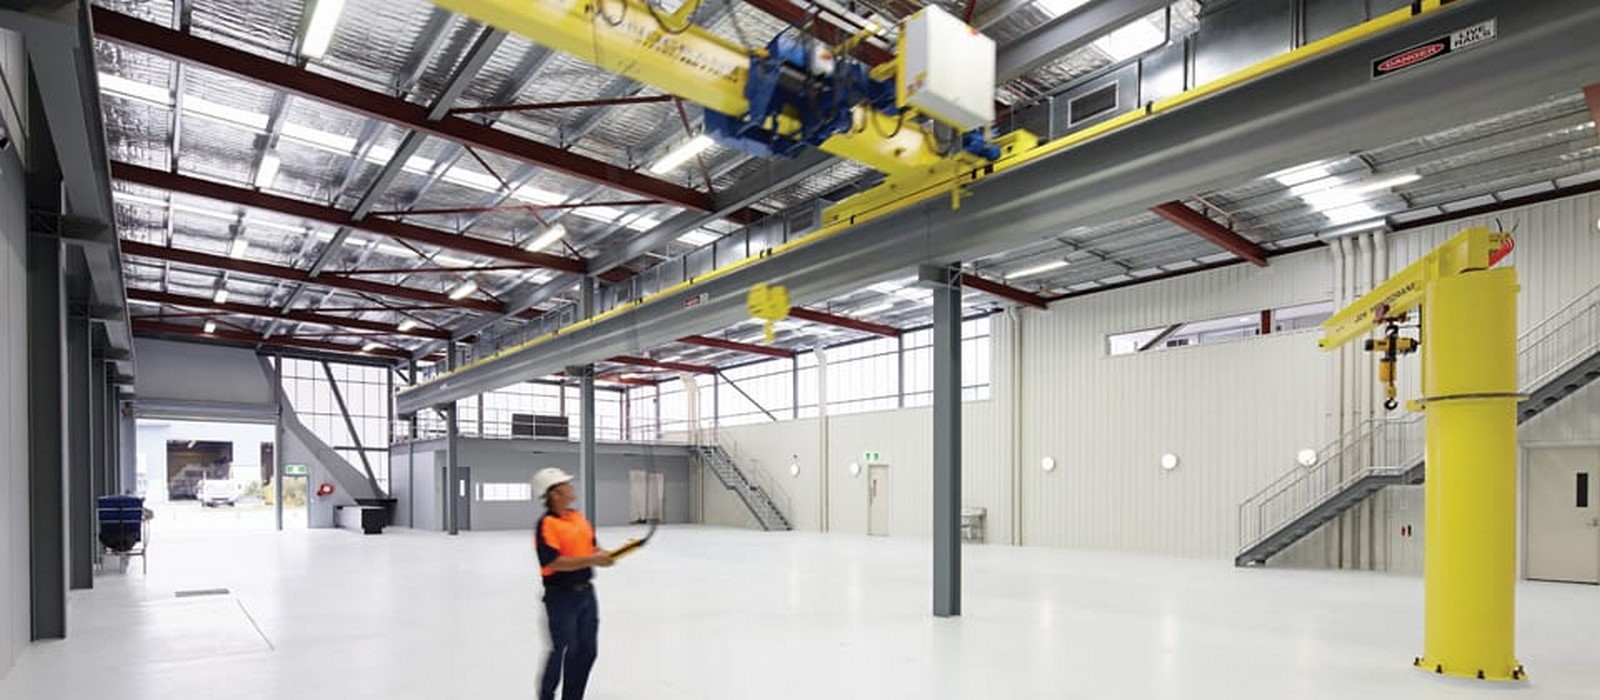 SEW Eurodrive Office and Warehouse, Welshpool, Western Australia - Sheet4